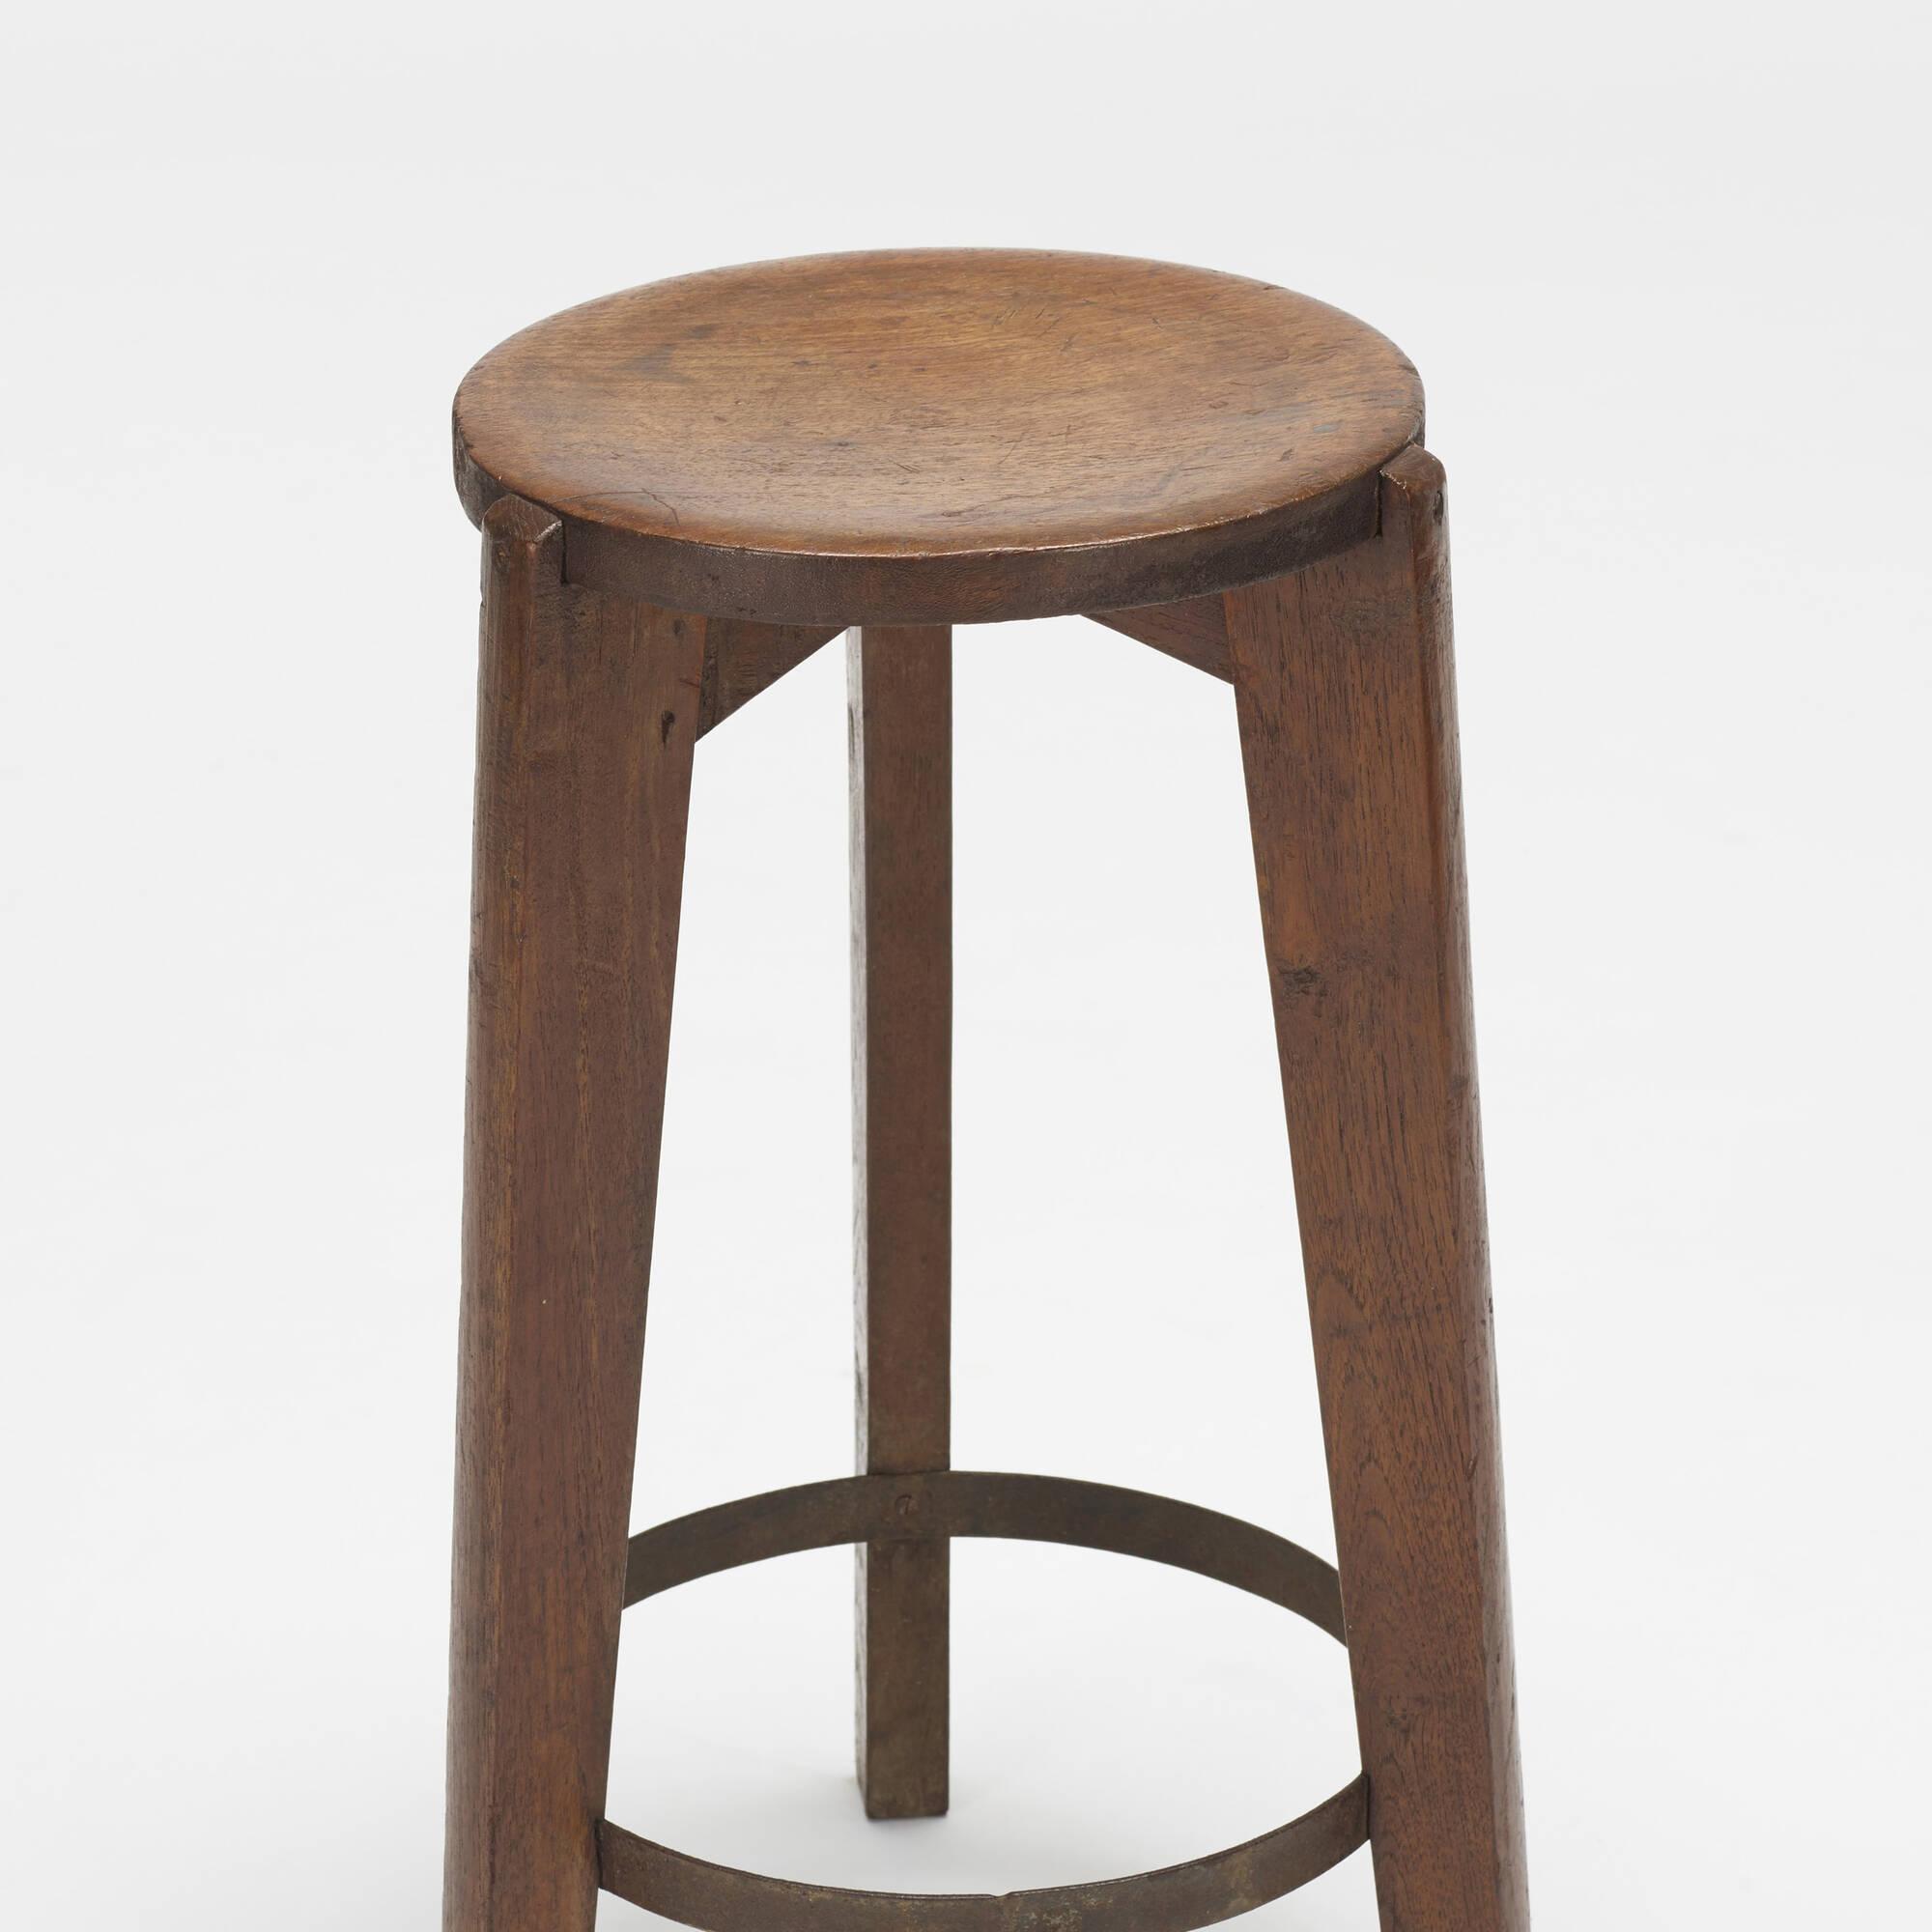 109: Pierre Jeanneret / set of three stools from Punjab University, Chandigarh (2 of 2)